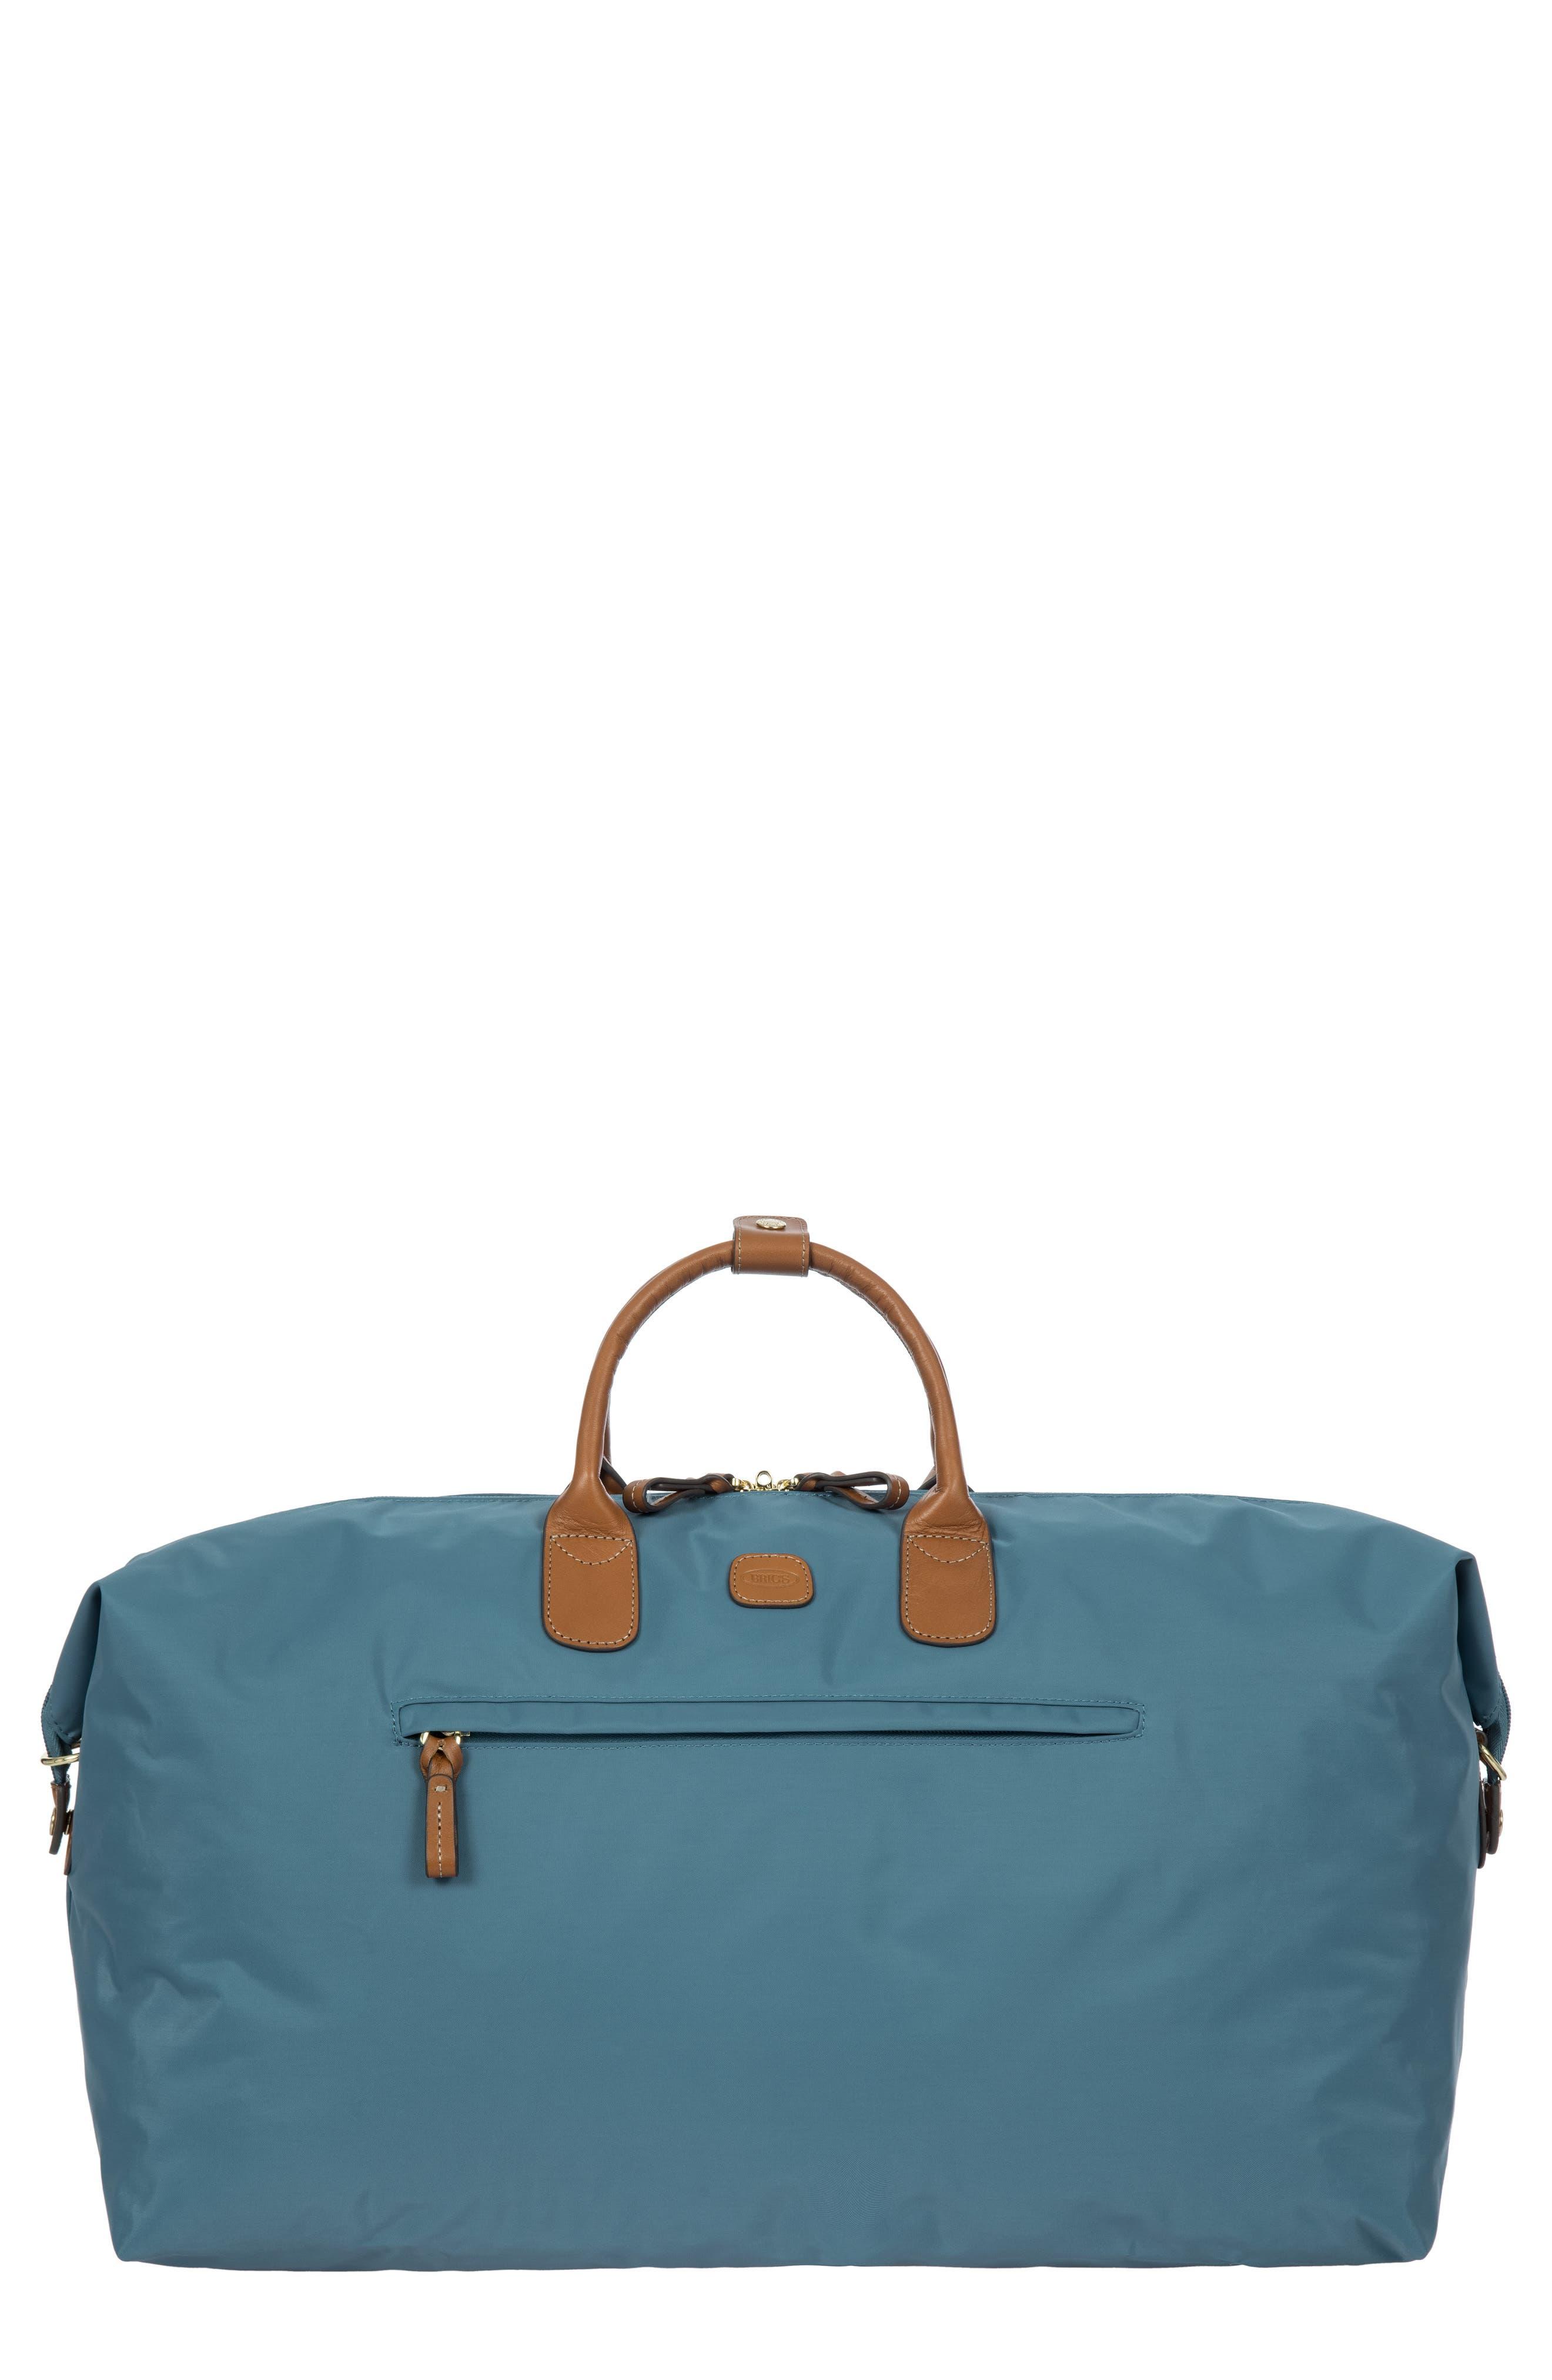 Bric's X-Bag Boarding 22-Inch Duffle Bag - Beige